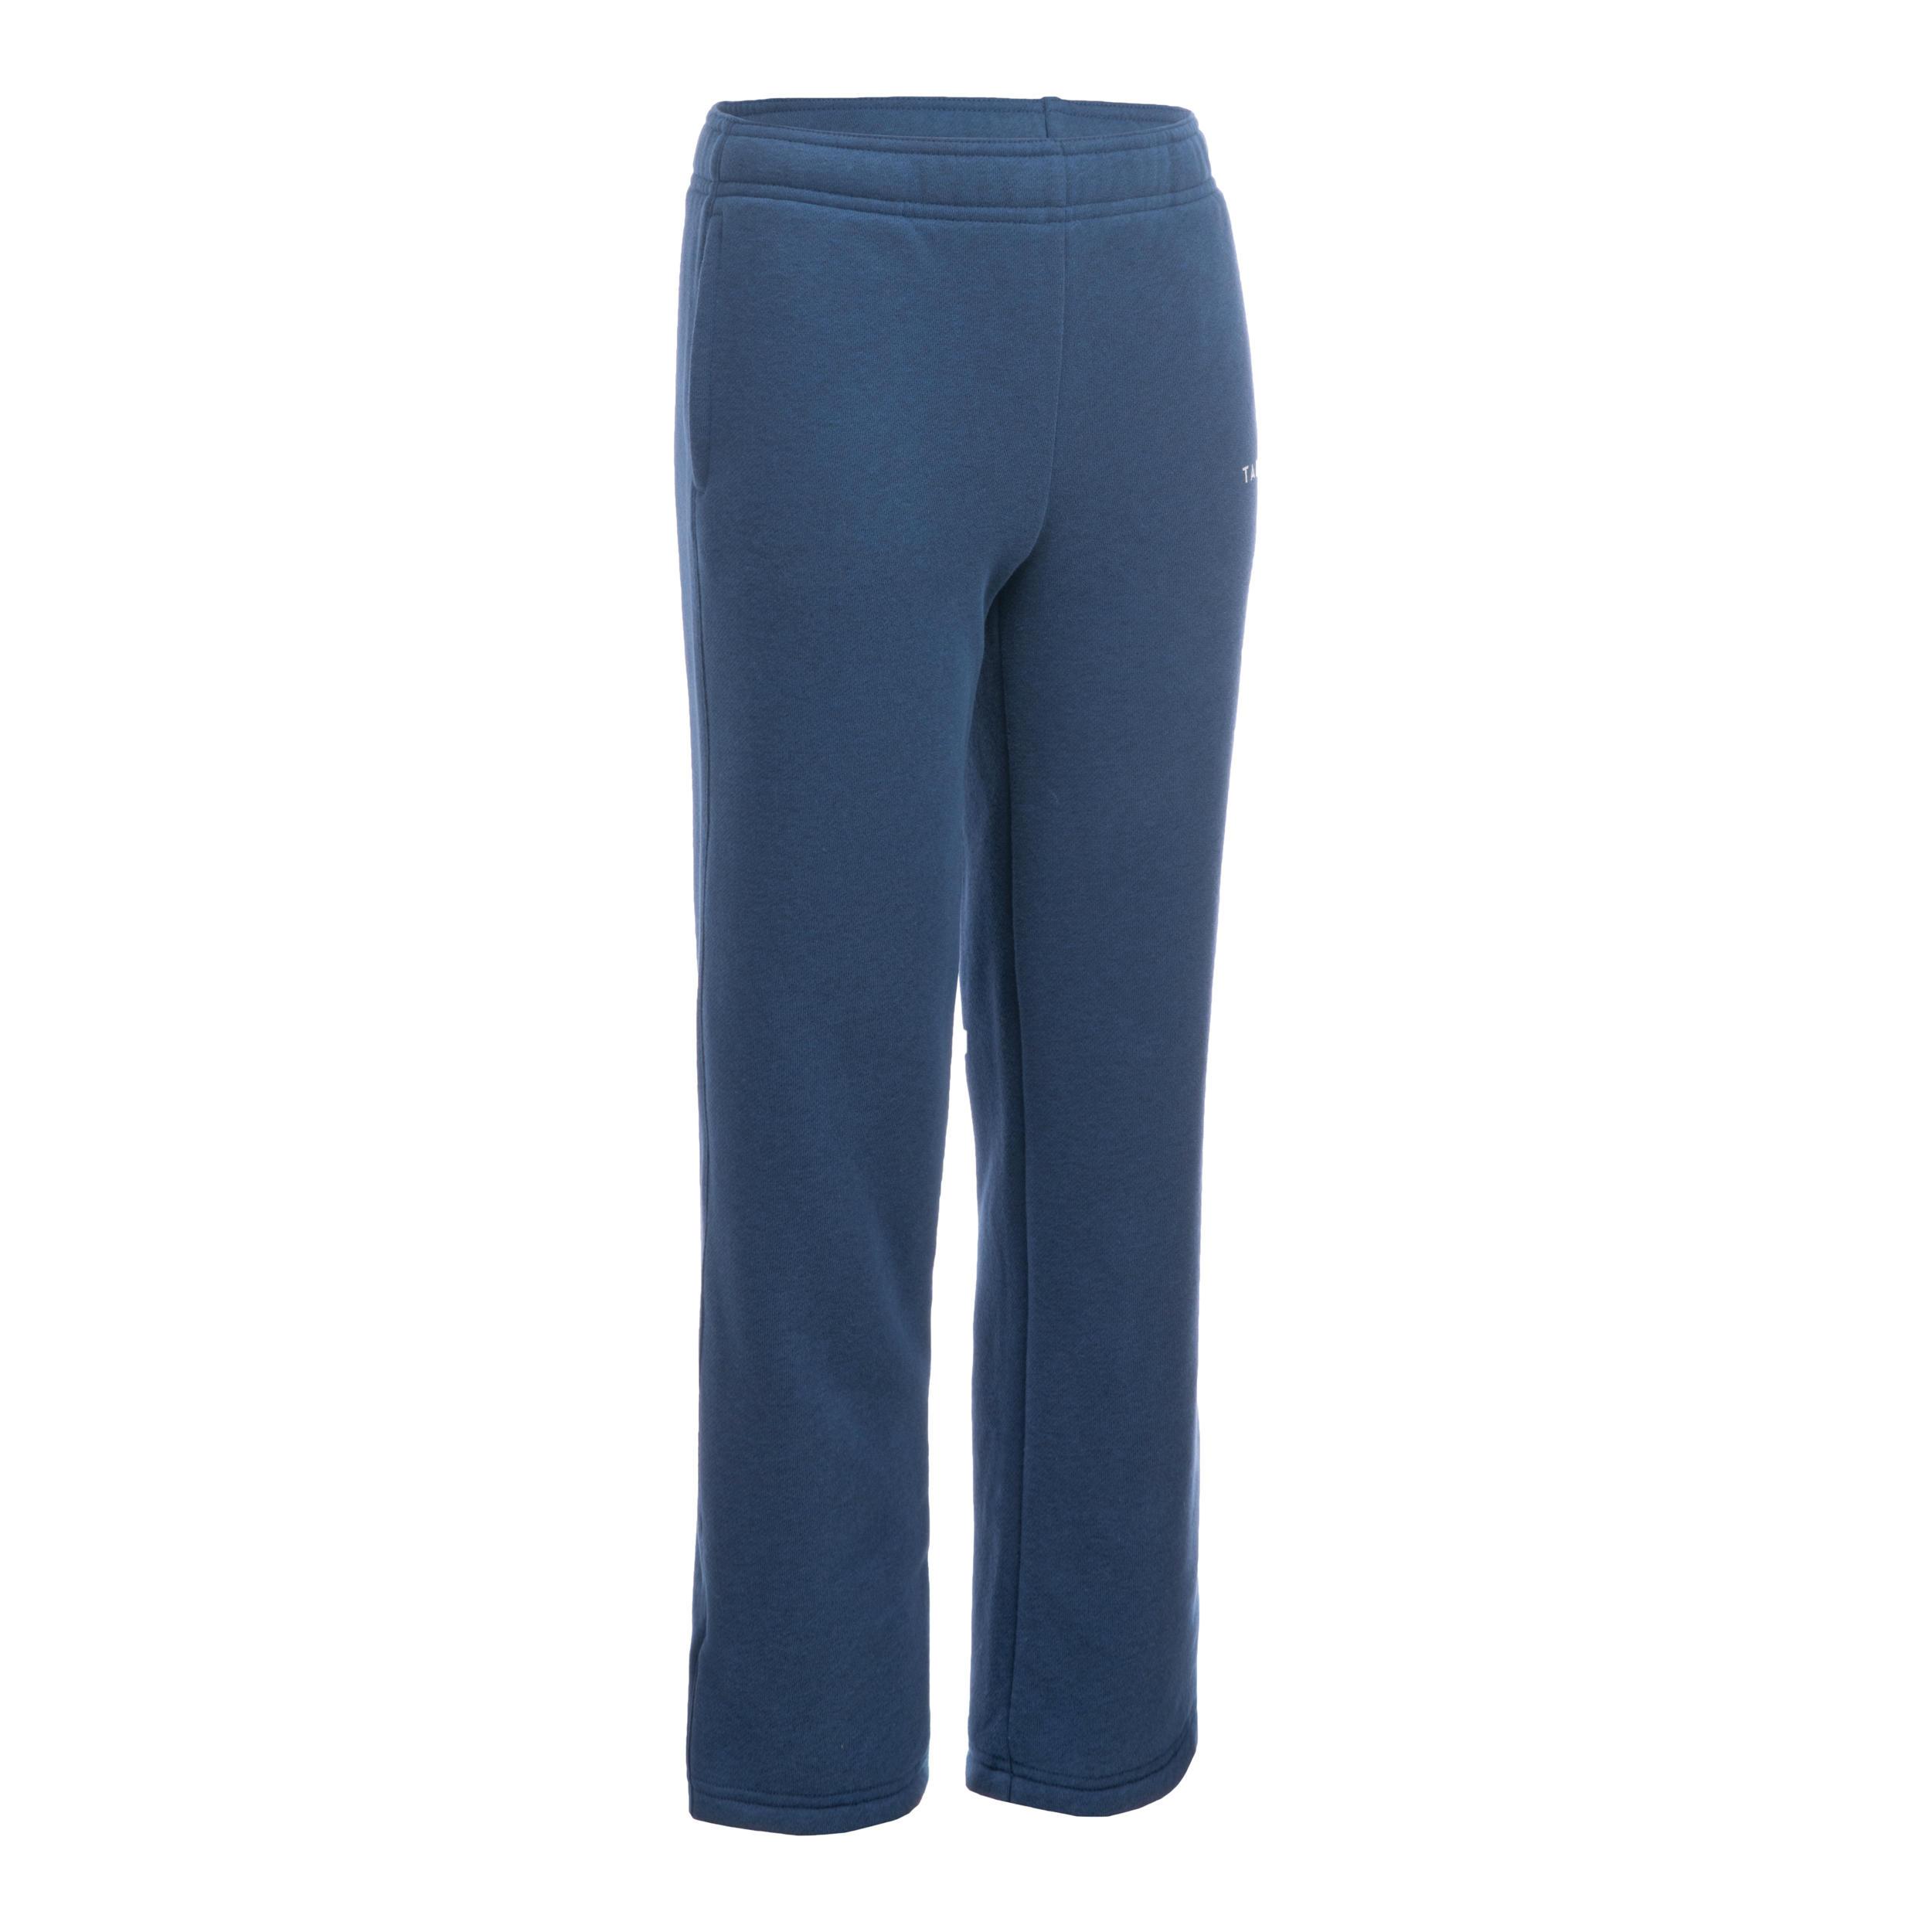 Pantalon Baschet P100 Copii la Reducere poza